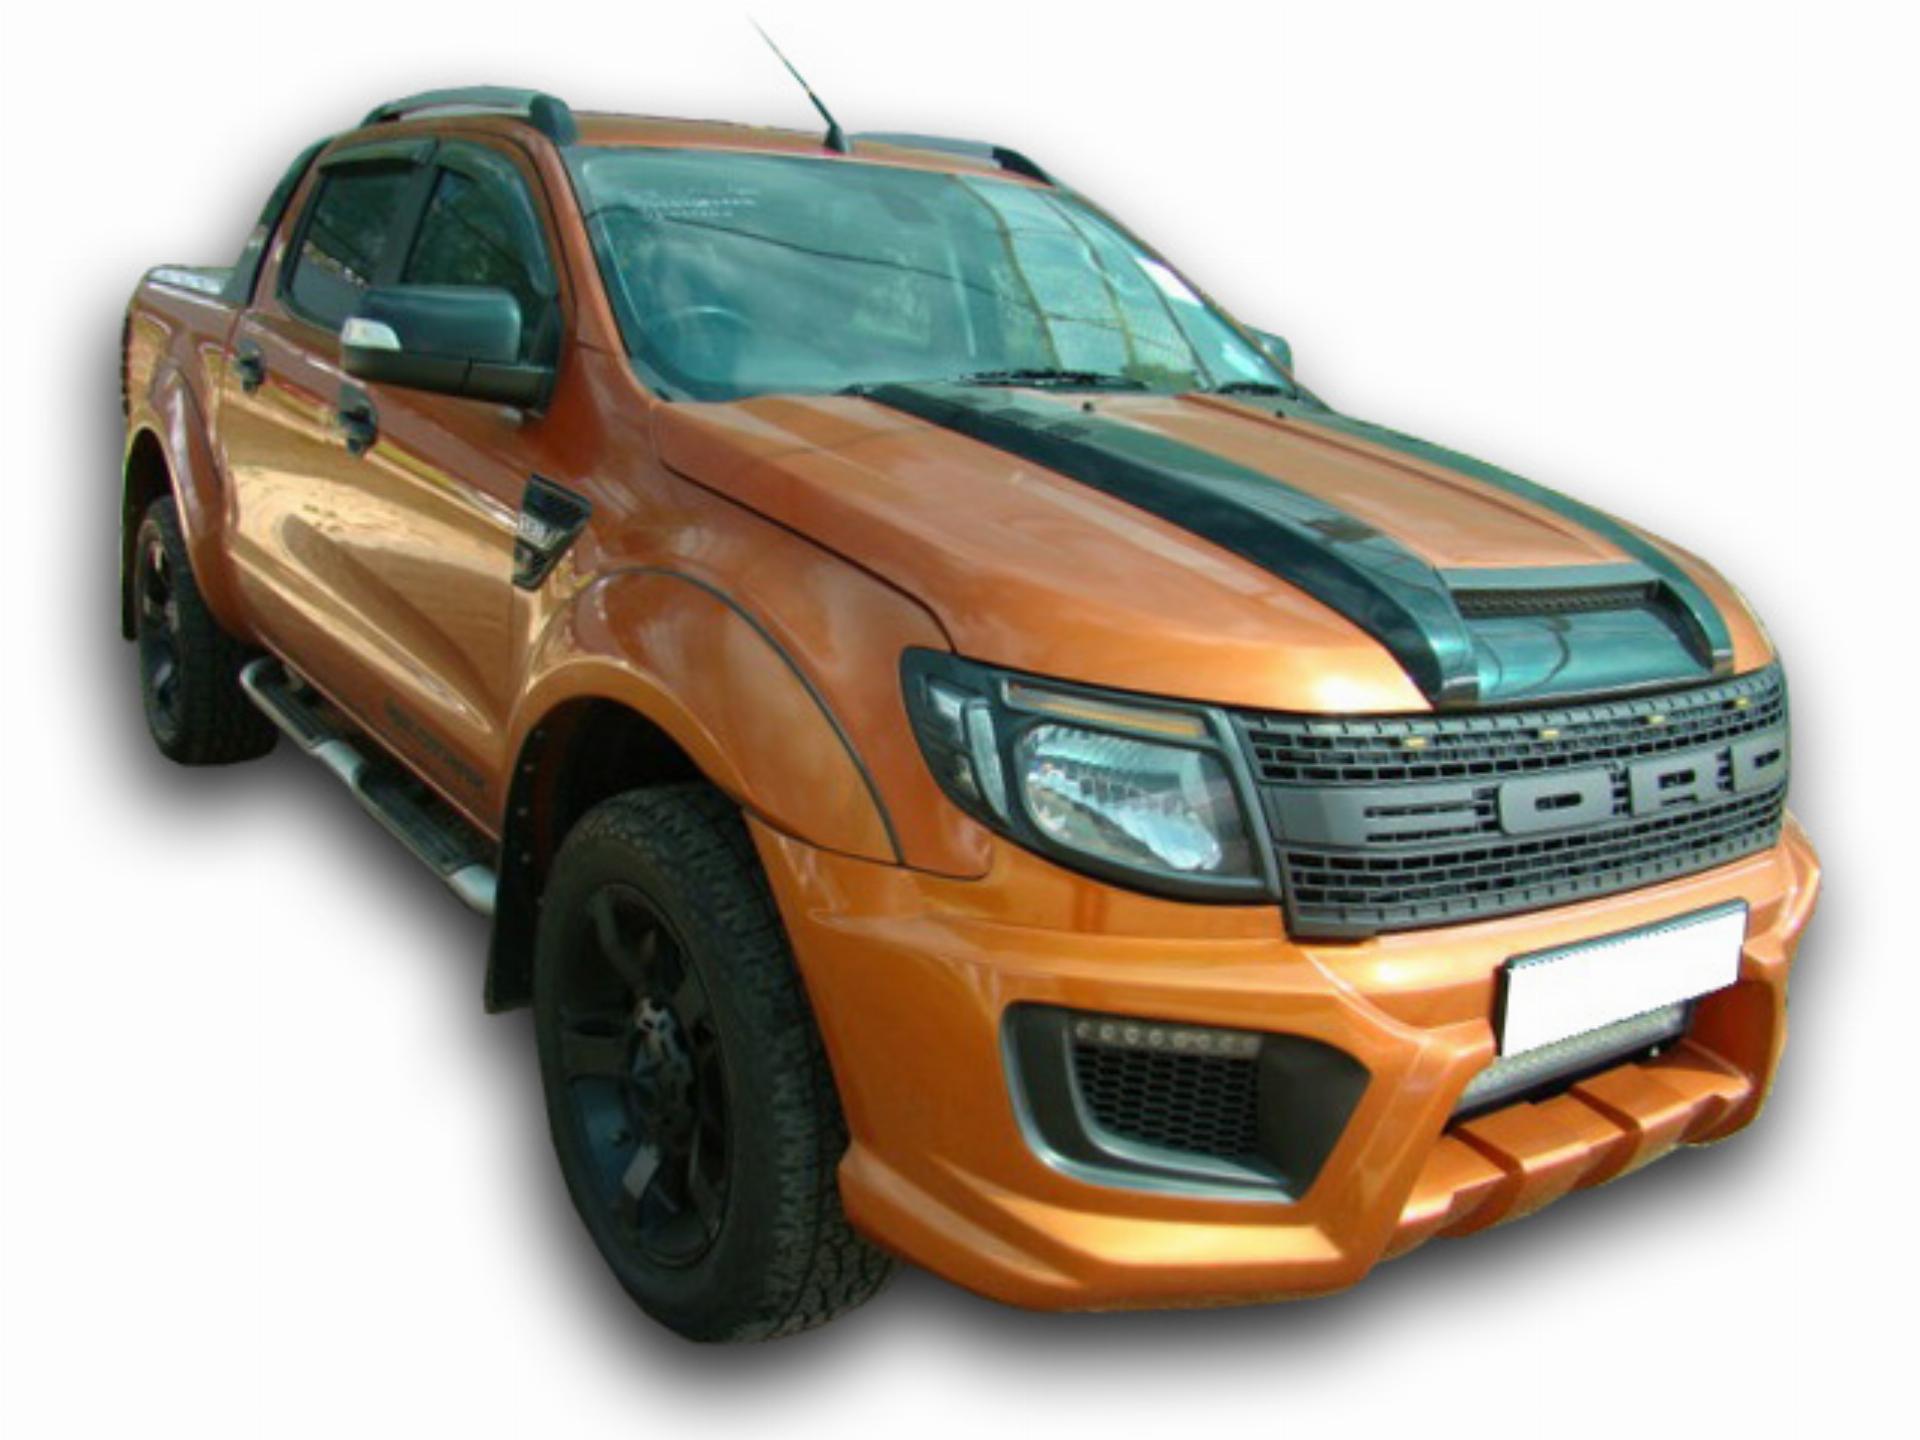 Ford Ranger 3.2 Tdci Wildtrack